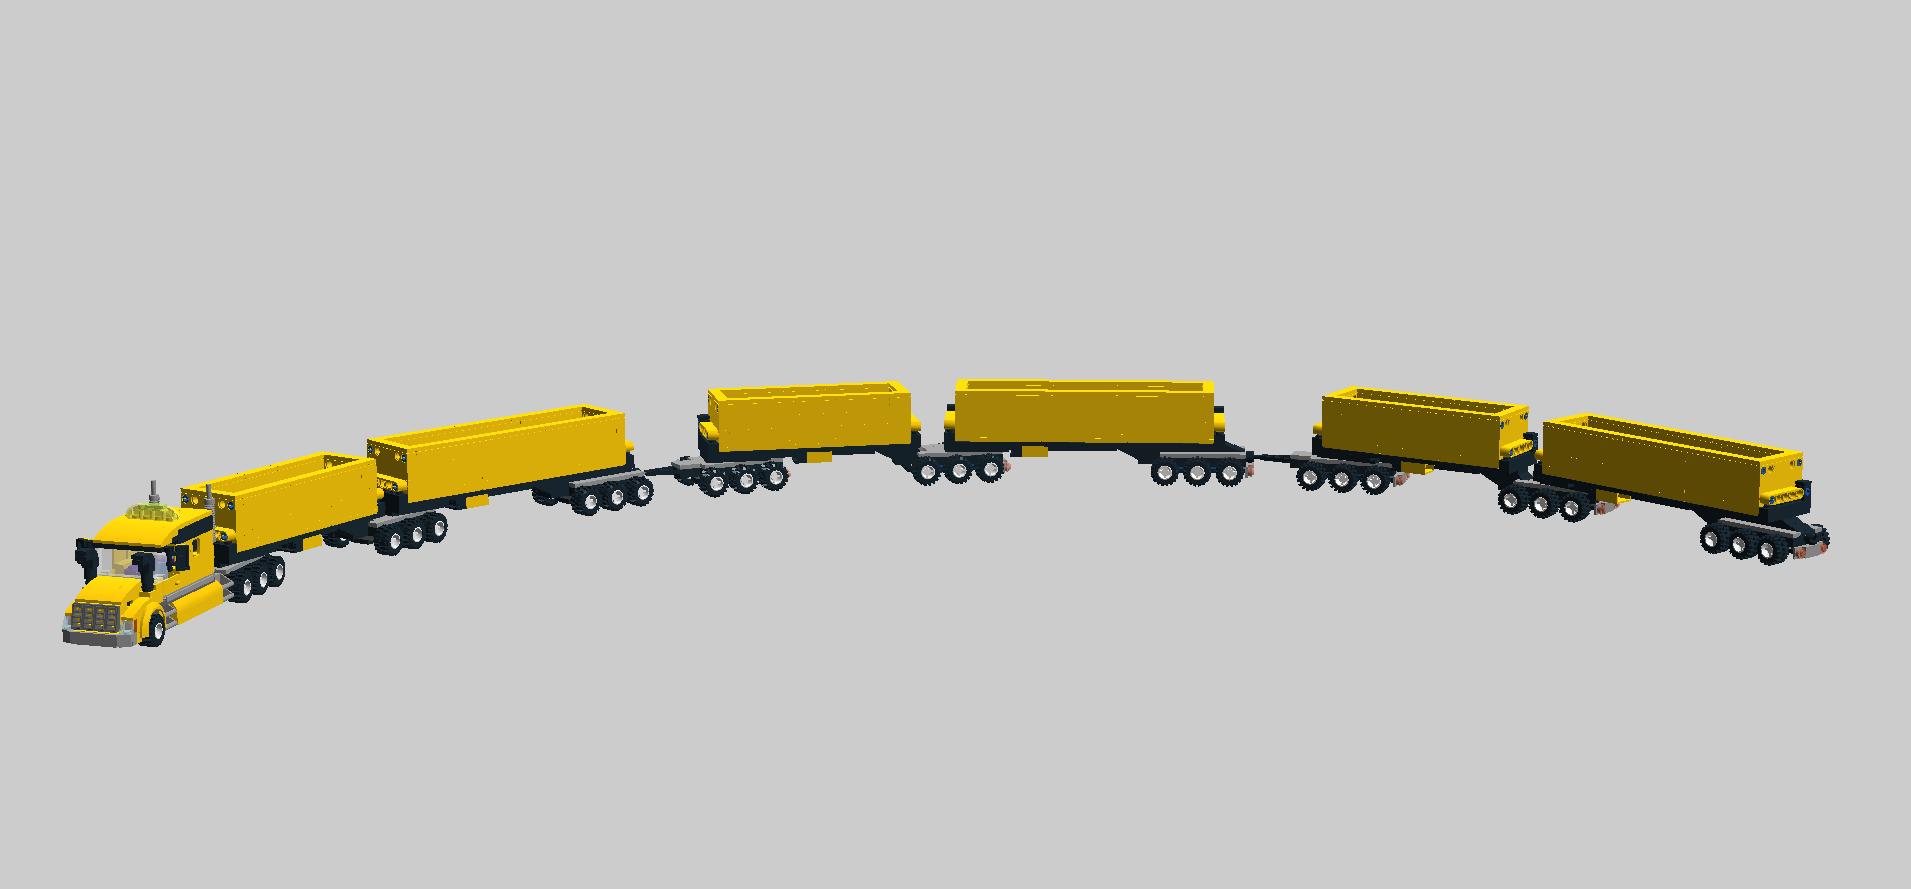 roadtrain_1_final_6t_4.png